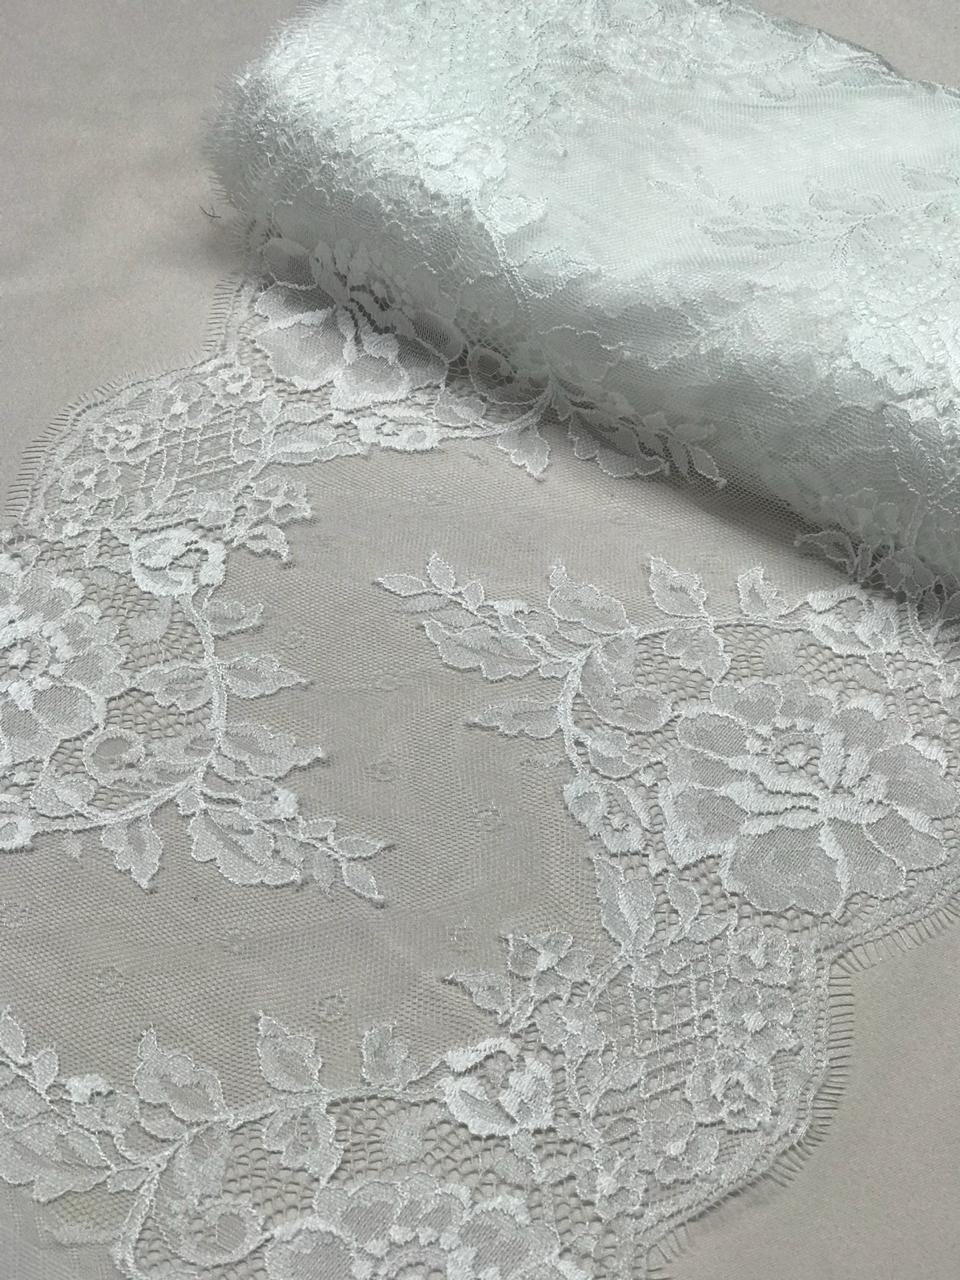 https://intertex-fabric.com/images/stories/virtuemart/product/шан.jpg